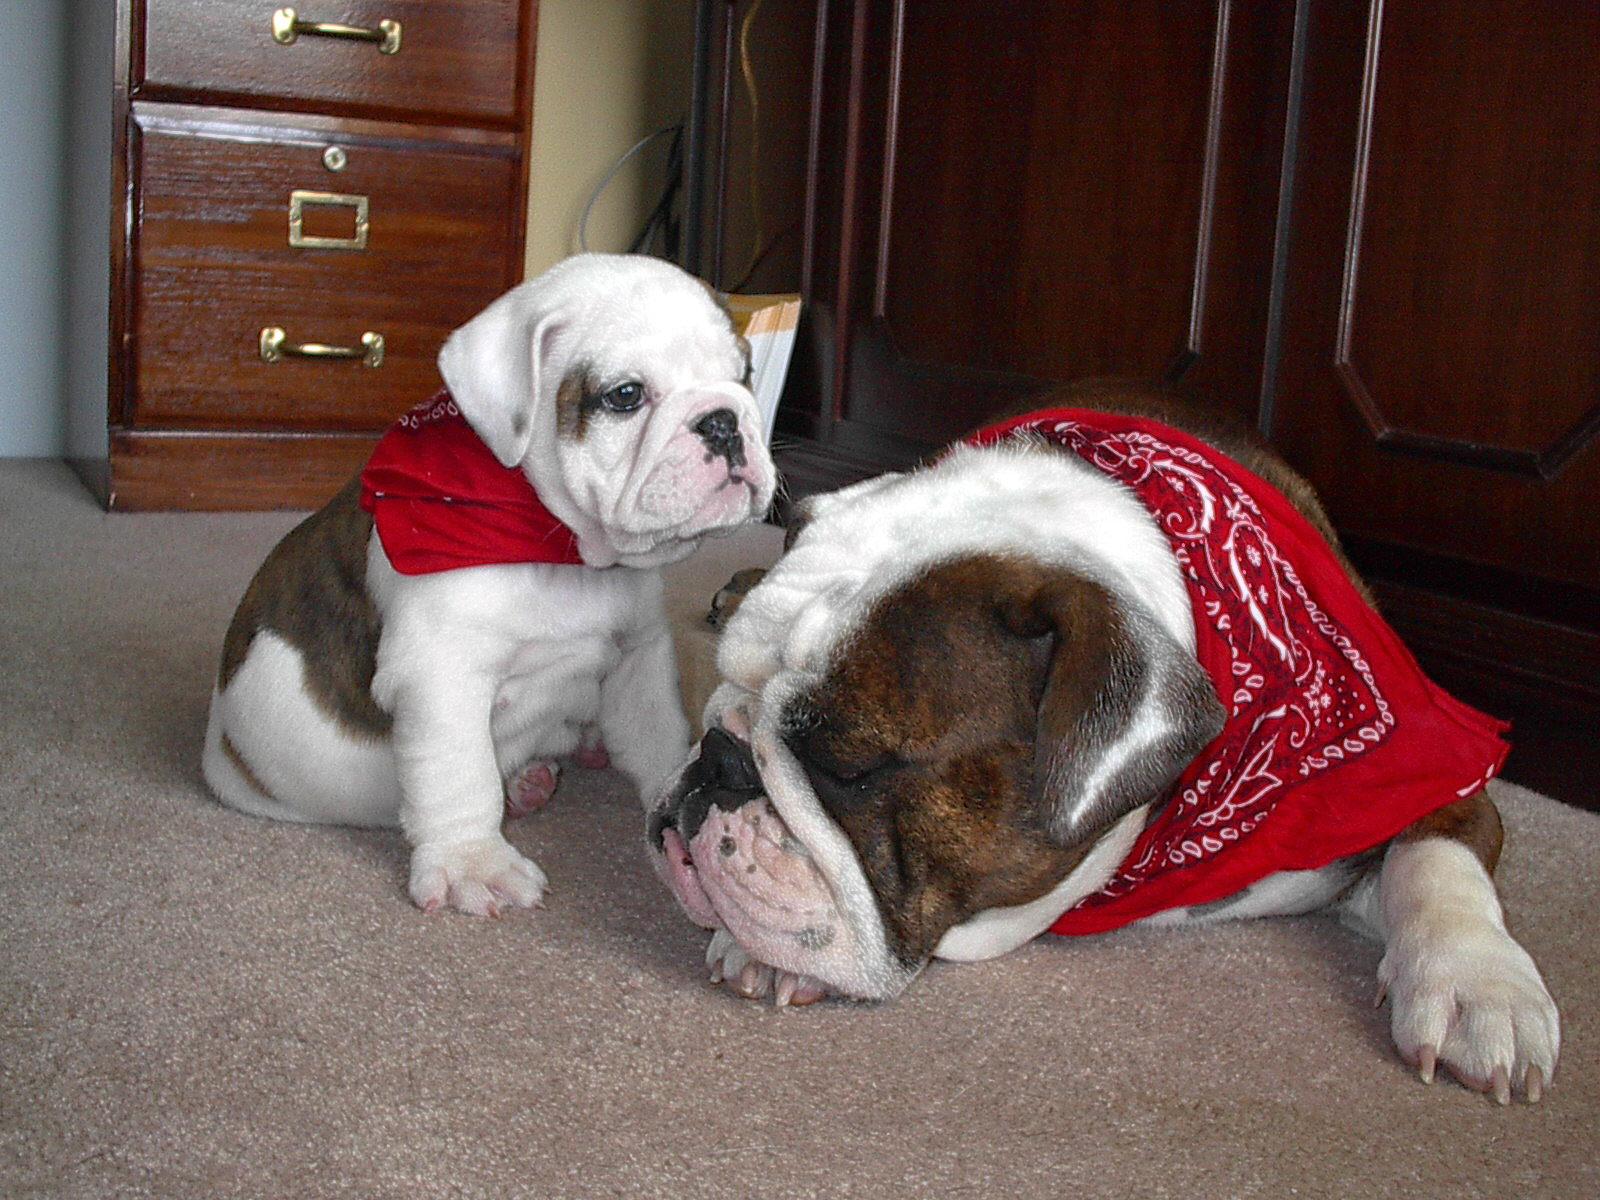 http://www.bulldogsoftimberridge.com/files/rox_pup_bandana.jpg